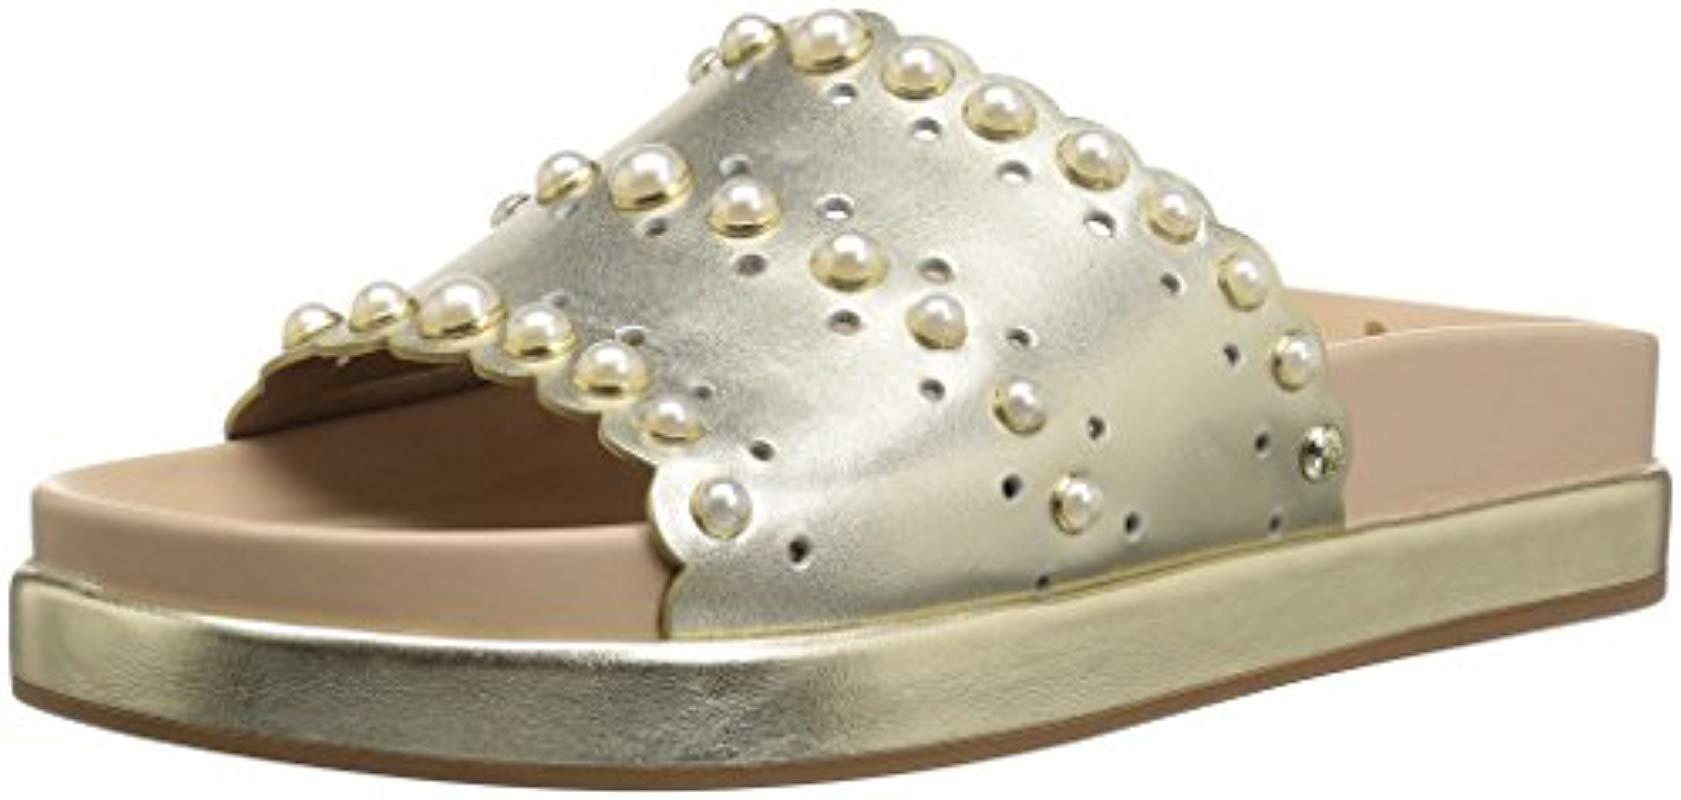 dcd4d5f5d35 Lyst - Sam Edelman Sera Slide Sandal in Metallic